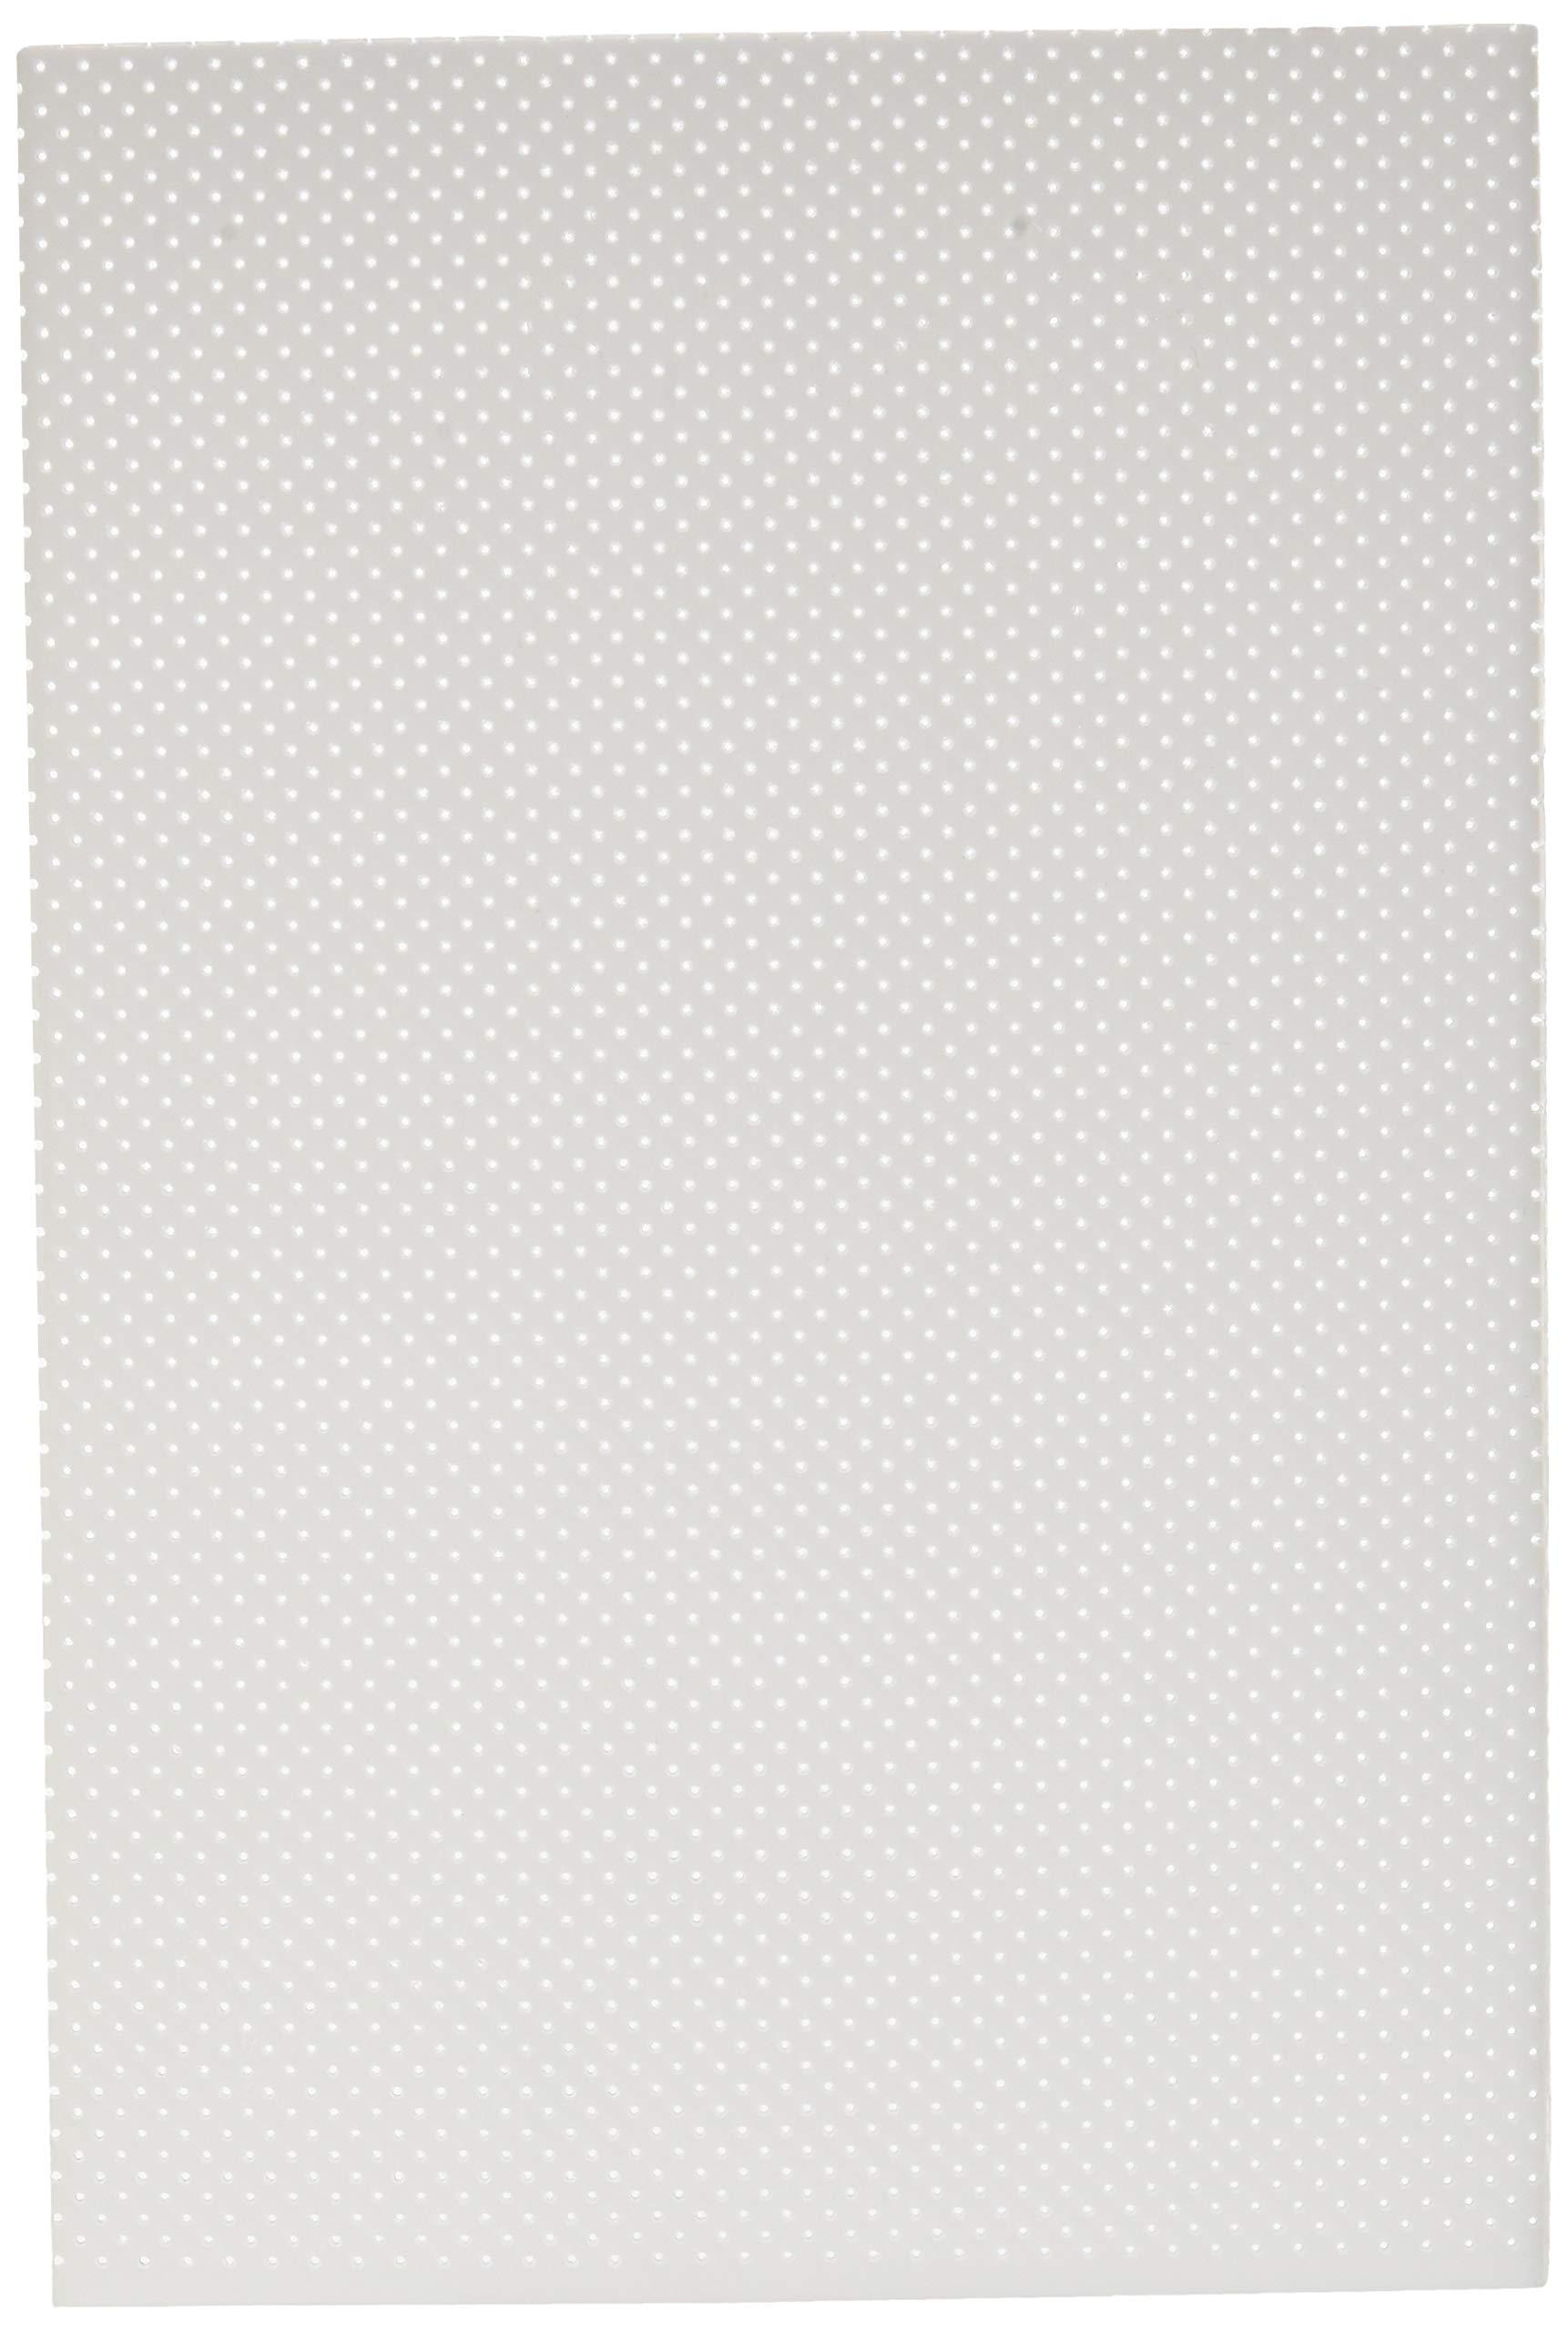 13/% UltraPerf Perforated Single Sheet 1//16 x 6 x 9 Aquaplast-T Rolyan Splinting Material Sheet White